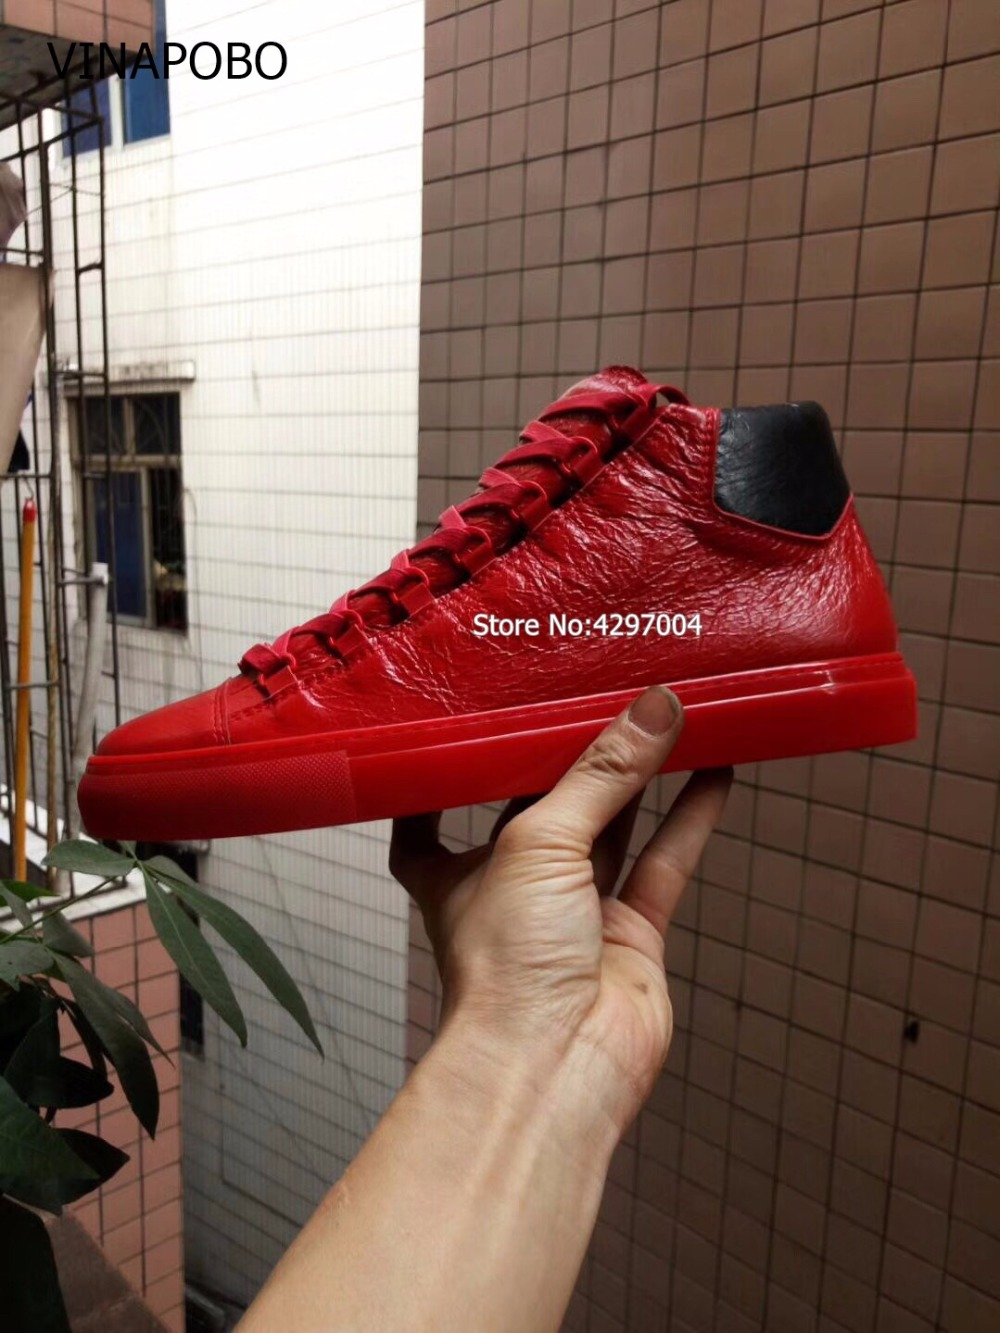 Vinapobo Big Size 38 46 Shoes Men Sneakers red leather Men Boots SuperStar Hip Hop Shoes